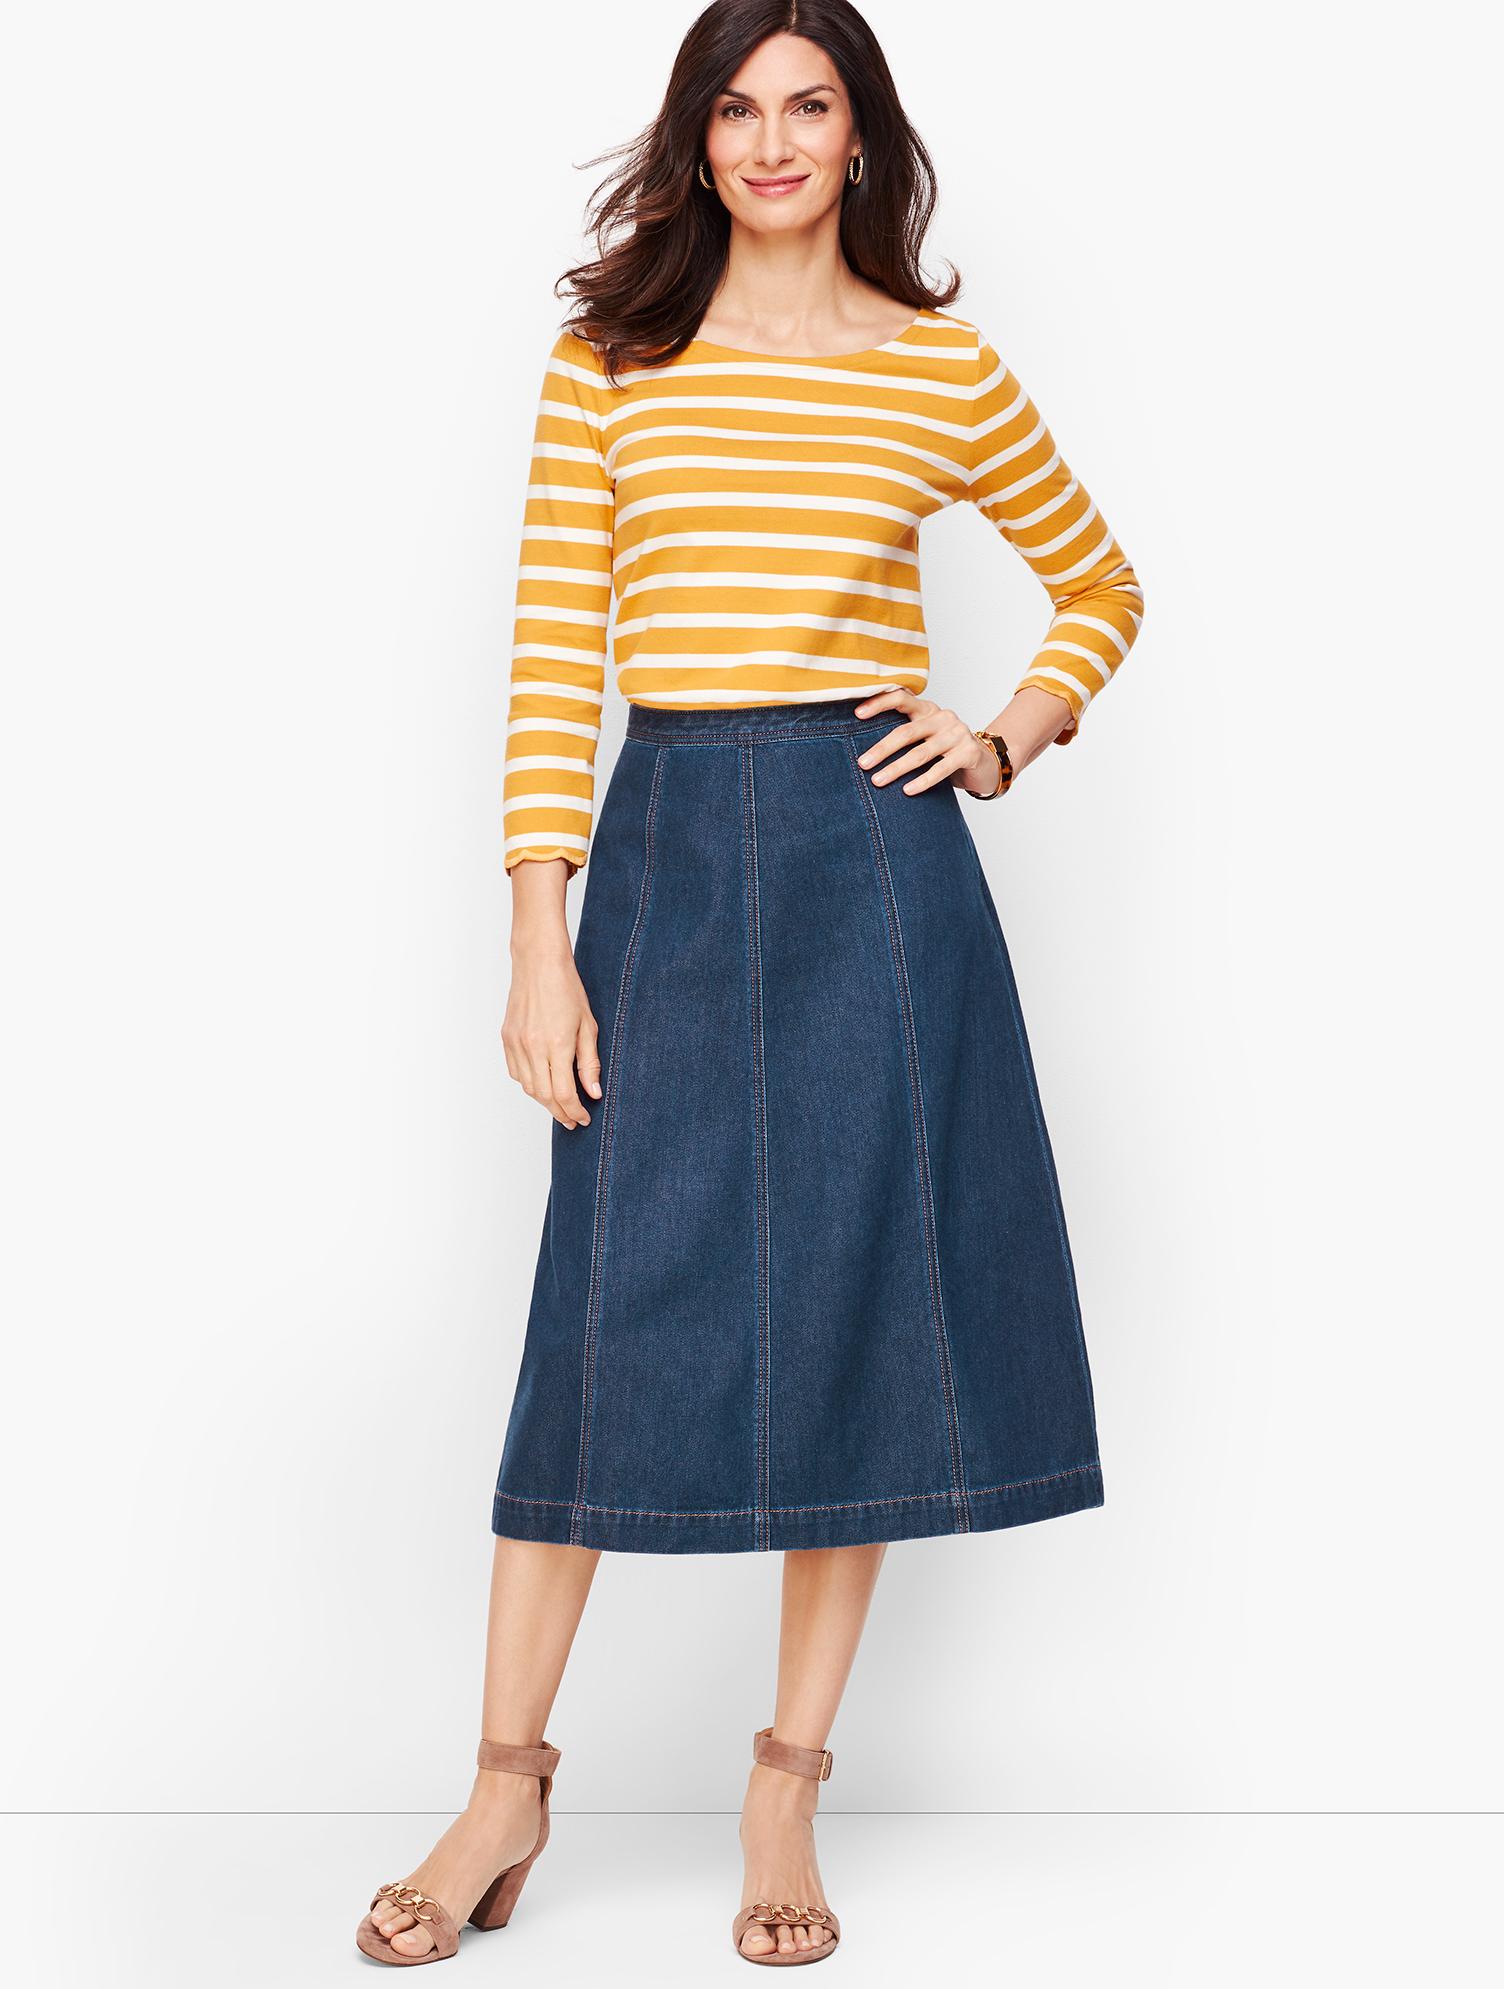 60s Skirts | 70s Hippie Skirts, Jumper Dresses Denim A-line Midi Skirt - DIANA-WASH - 16 - Talbots $74.25 AT vintagedancer.com